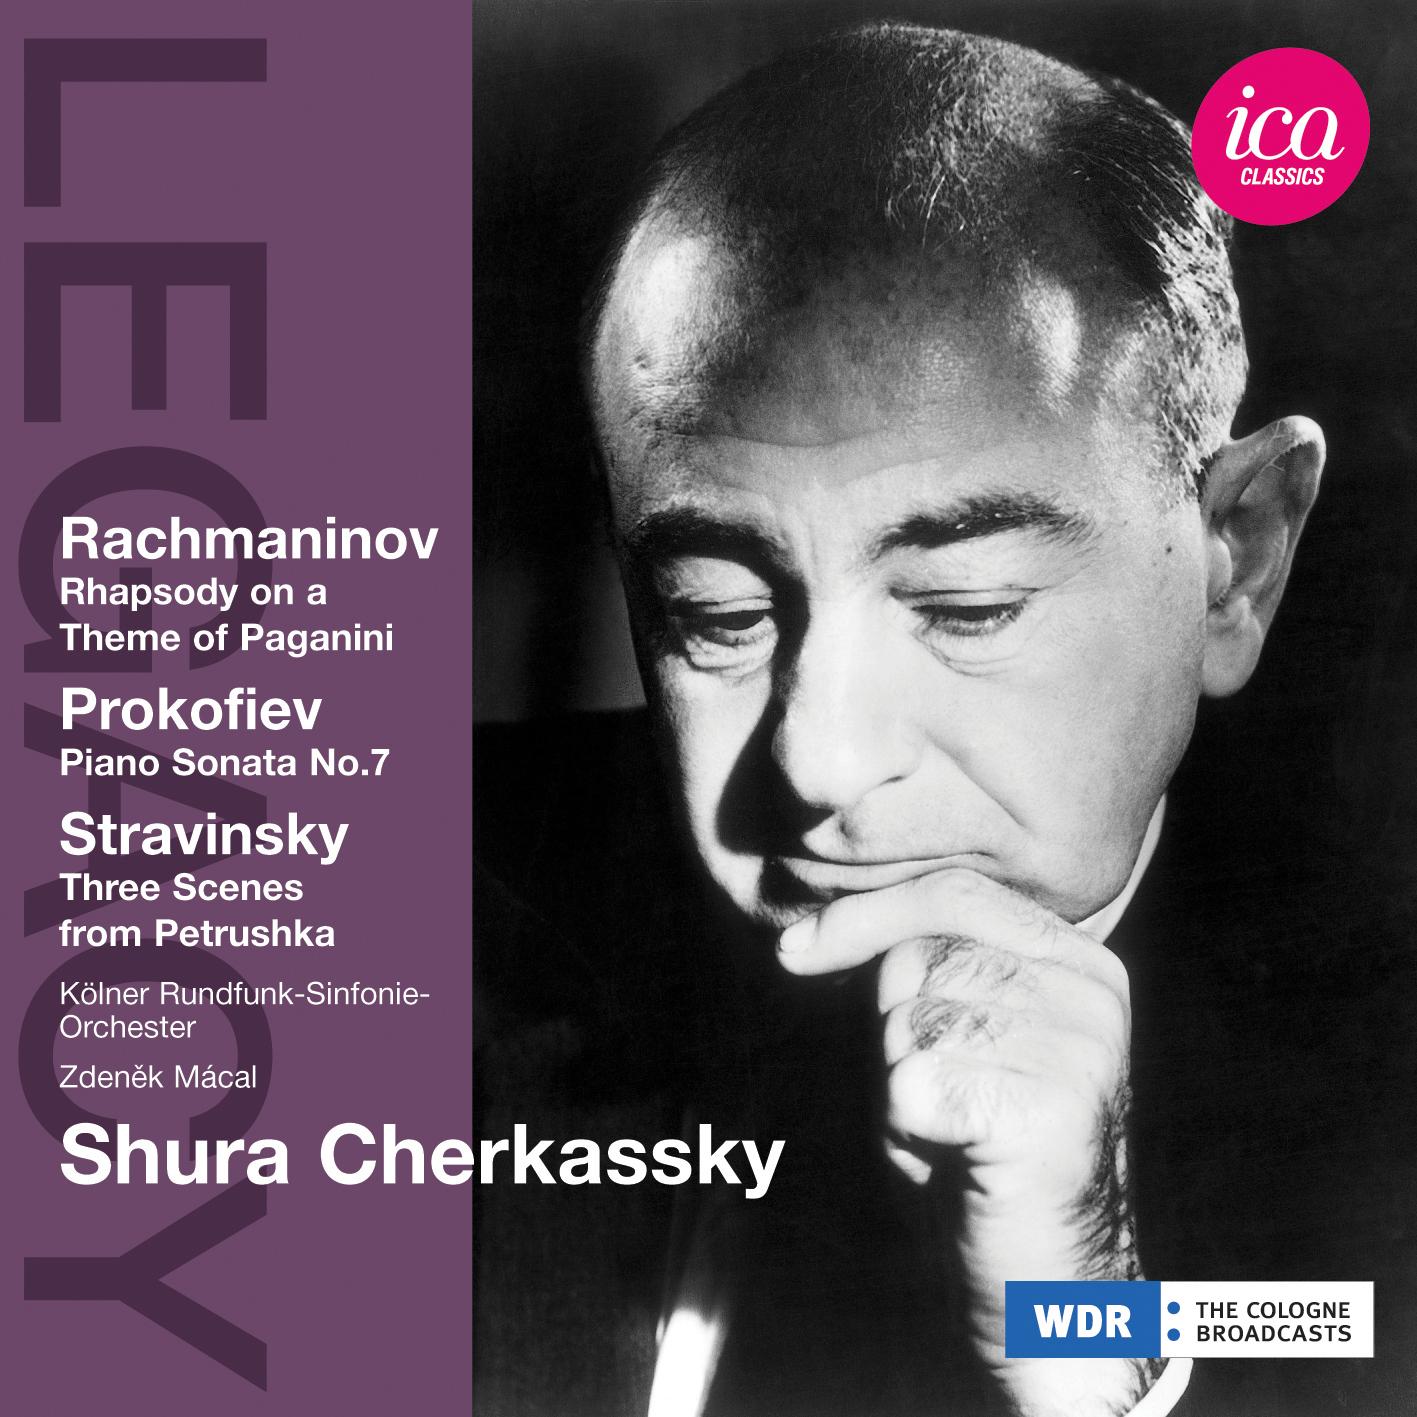 Rachmaninov- Rhapsody on a Theme of Paganini Variation 15